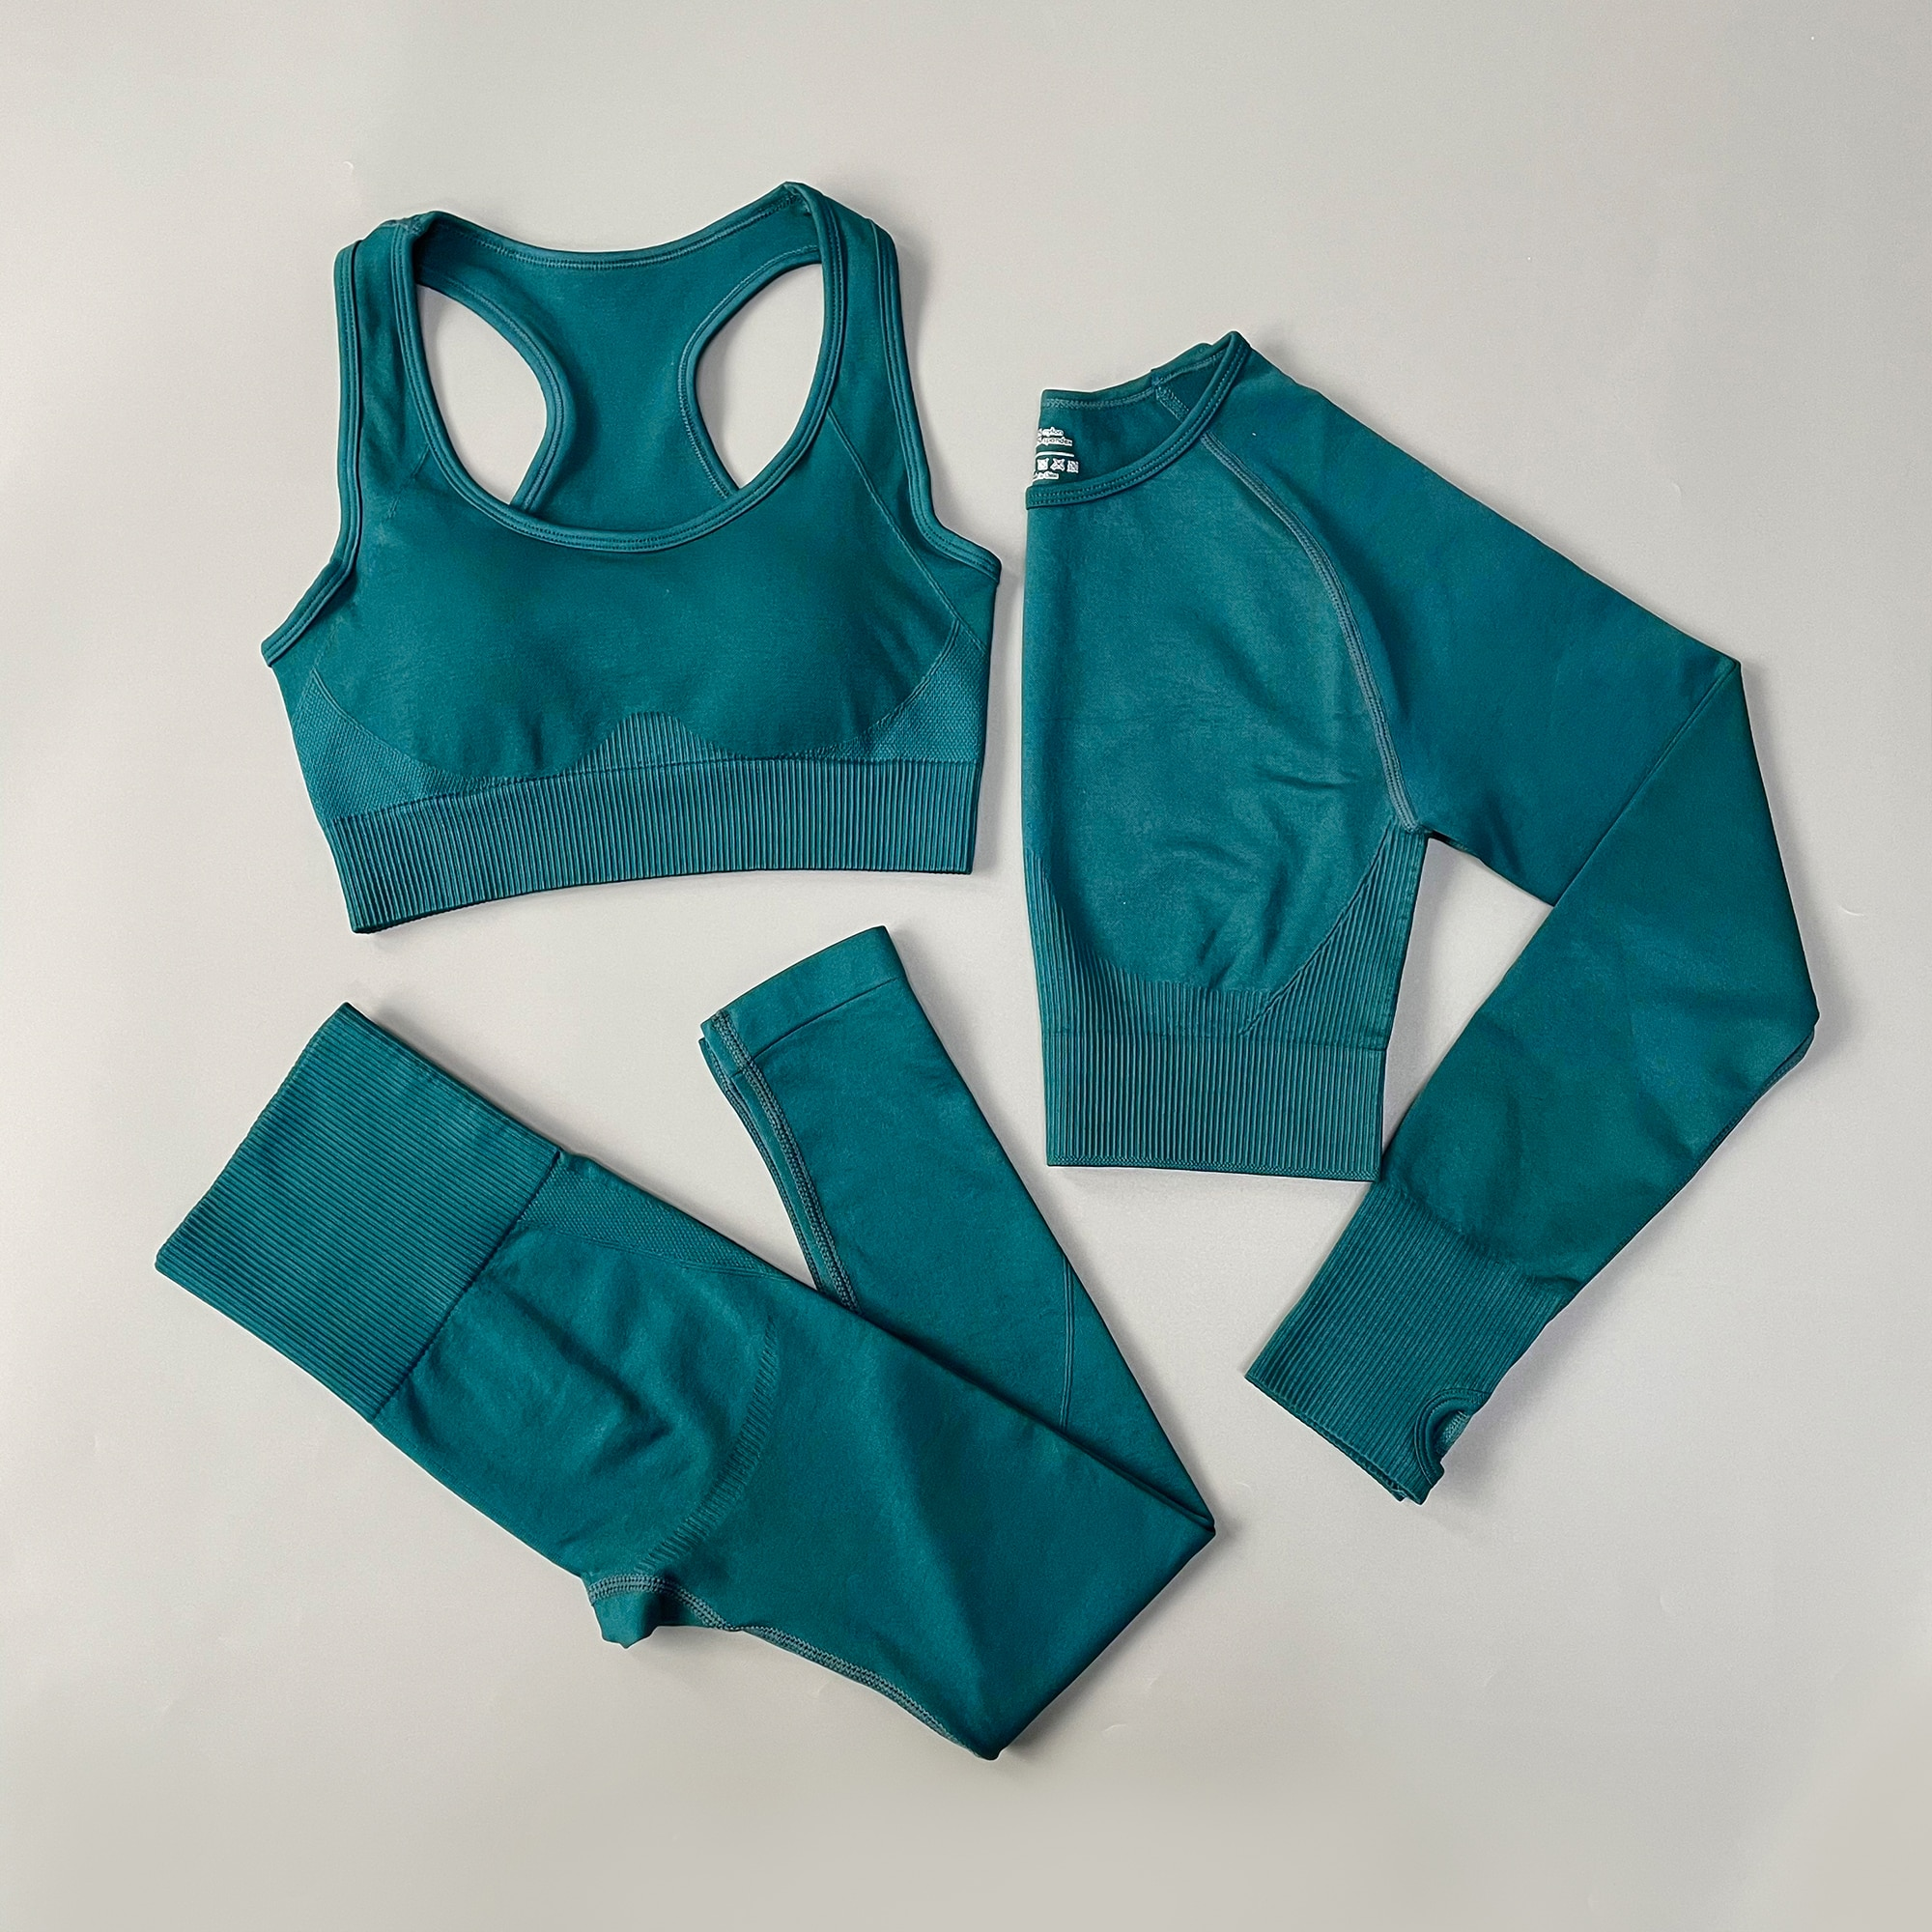 Fitness Women Yoga Set Seamless Sportswear Workout Sport Leggings+top+Bra Gym Set Woman Gym Clothing Shorts Sets 2021 HOT